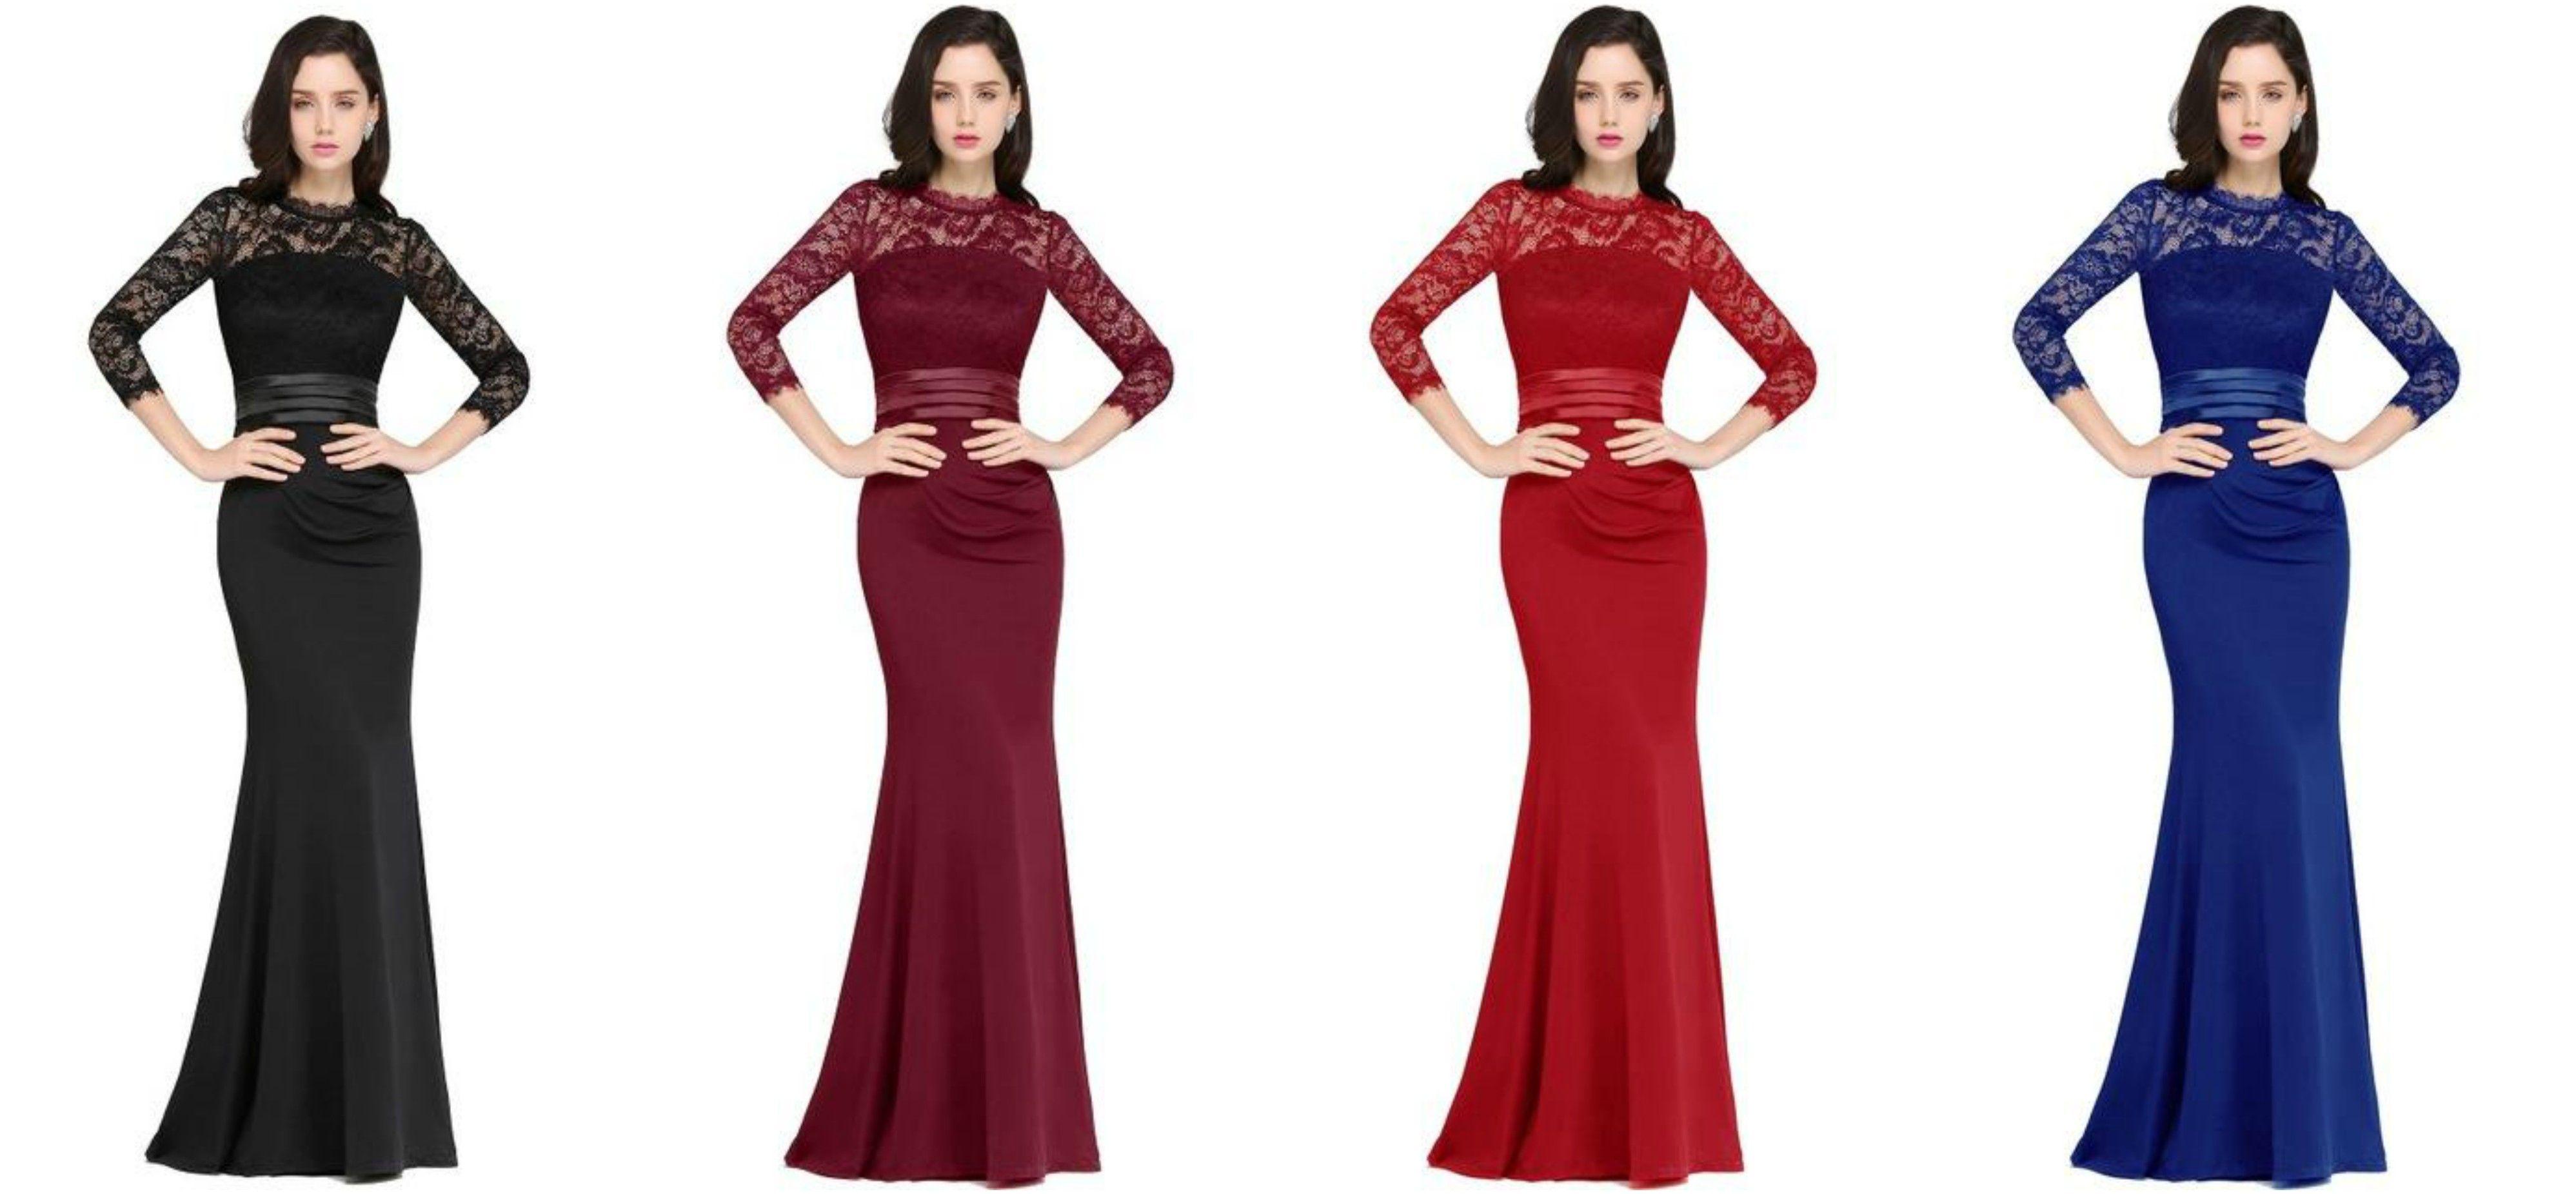 Burgundy mermaid long formal evening dresses long sleeve lace prom